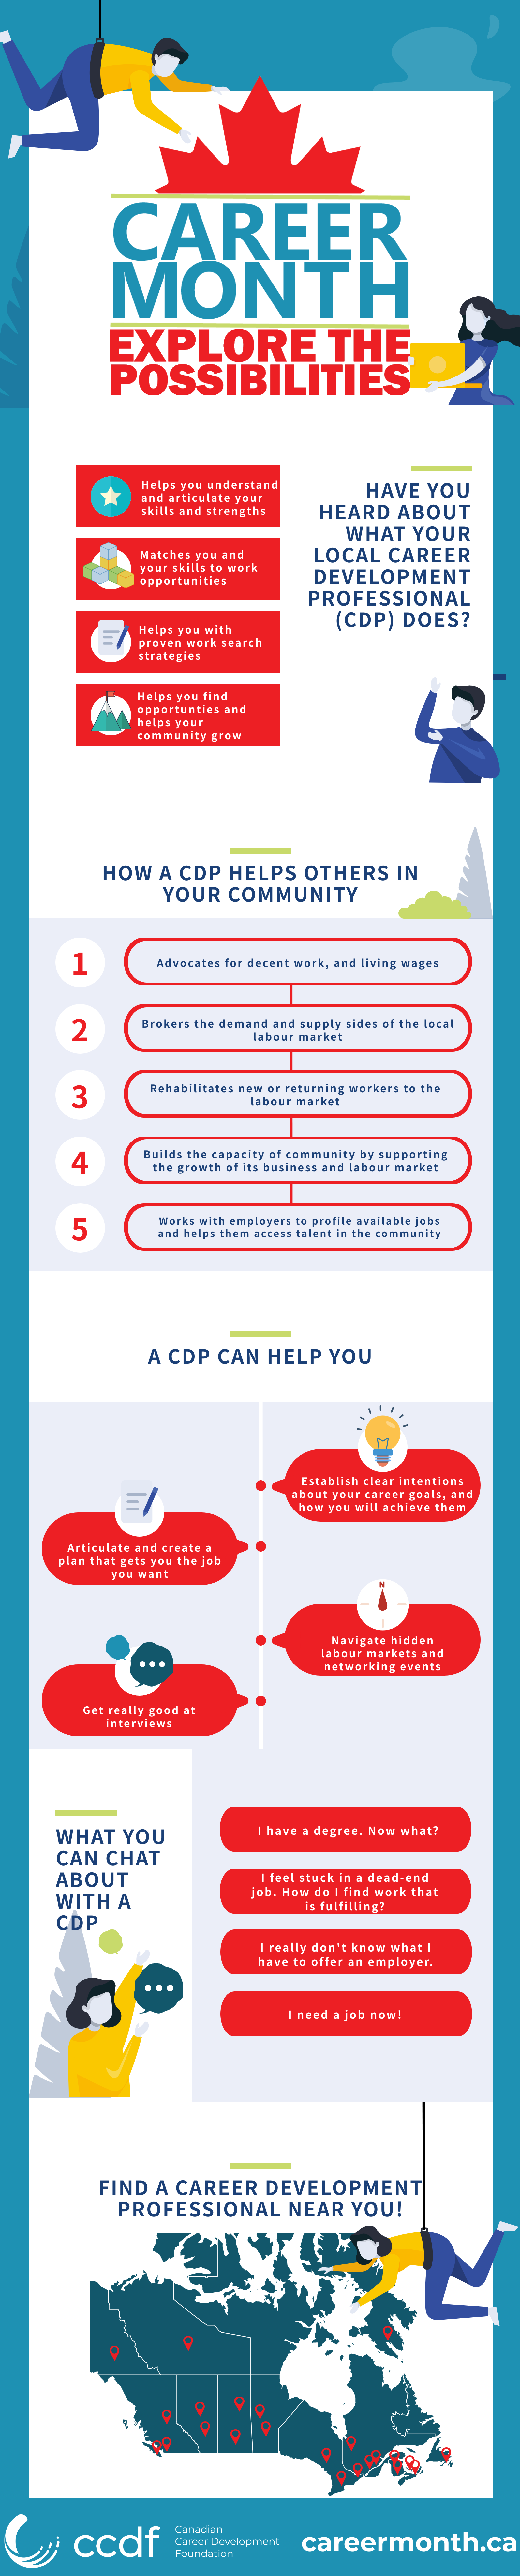 Explore The Possibilities Infographic